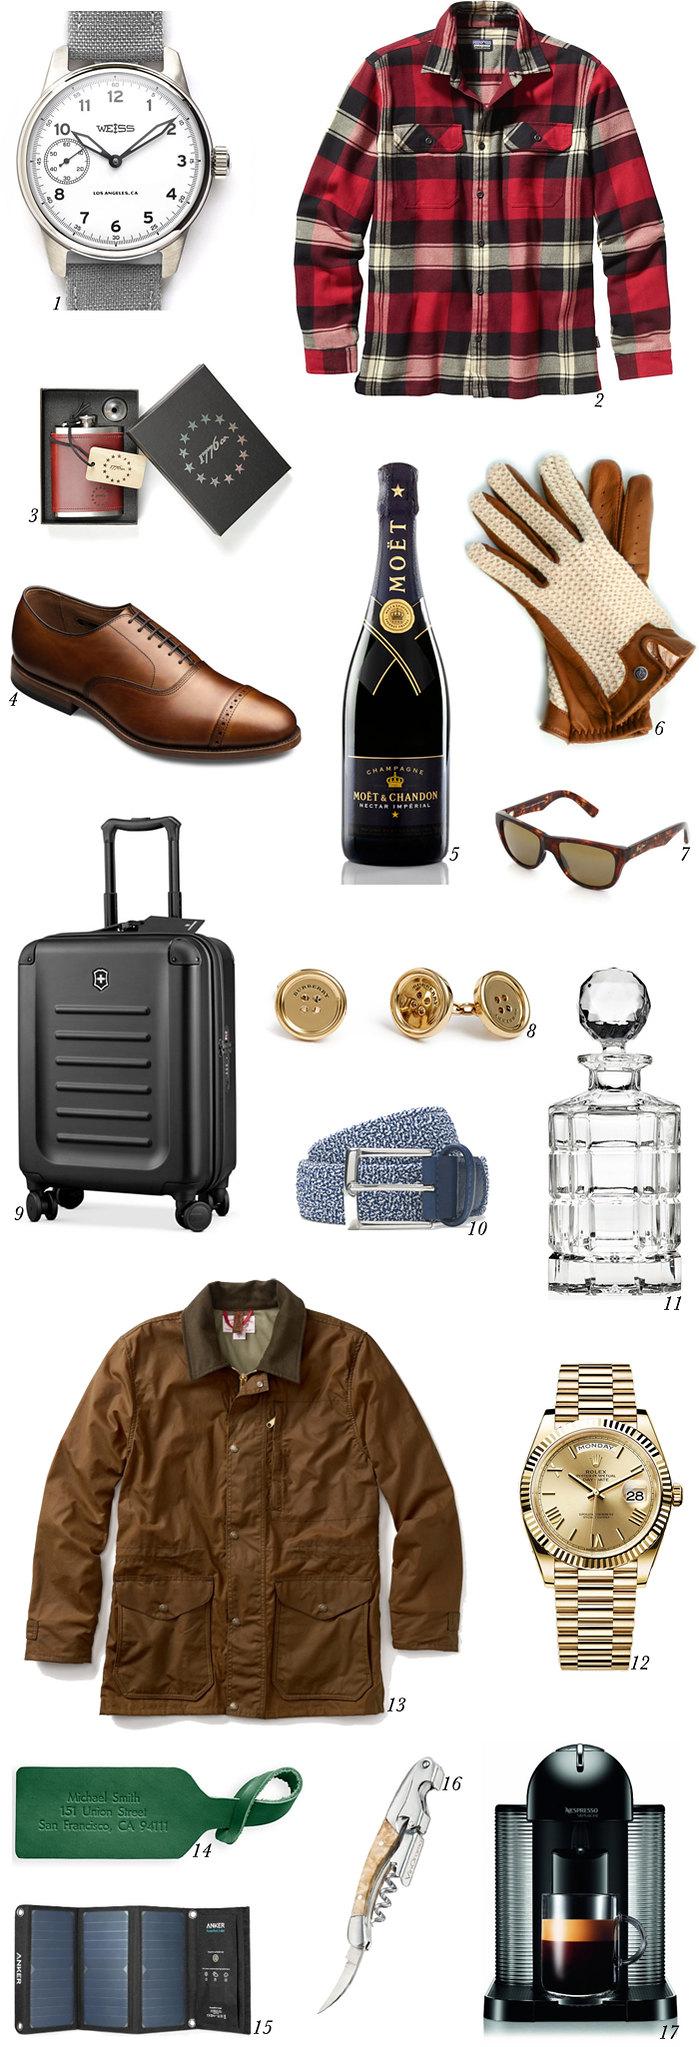 2015 holiday wish list men